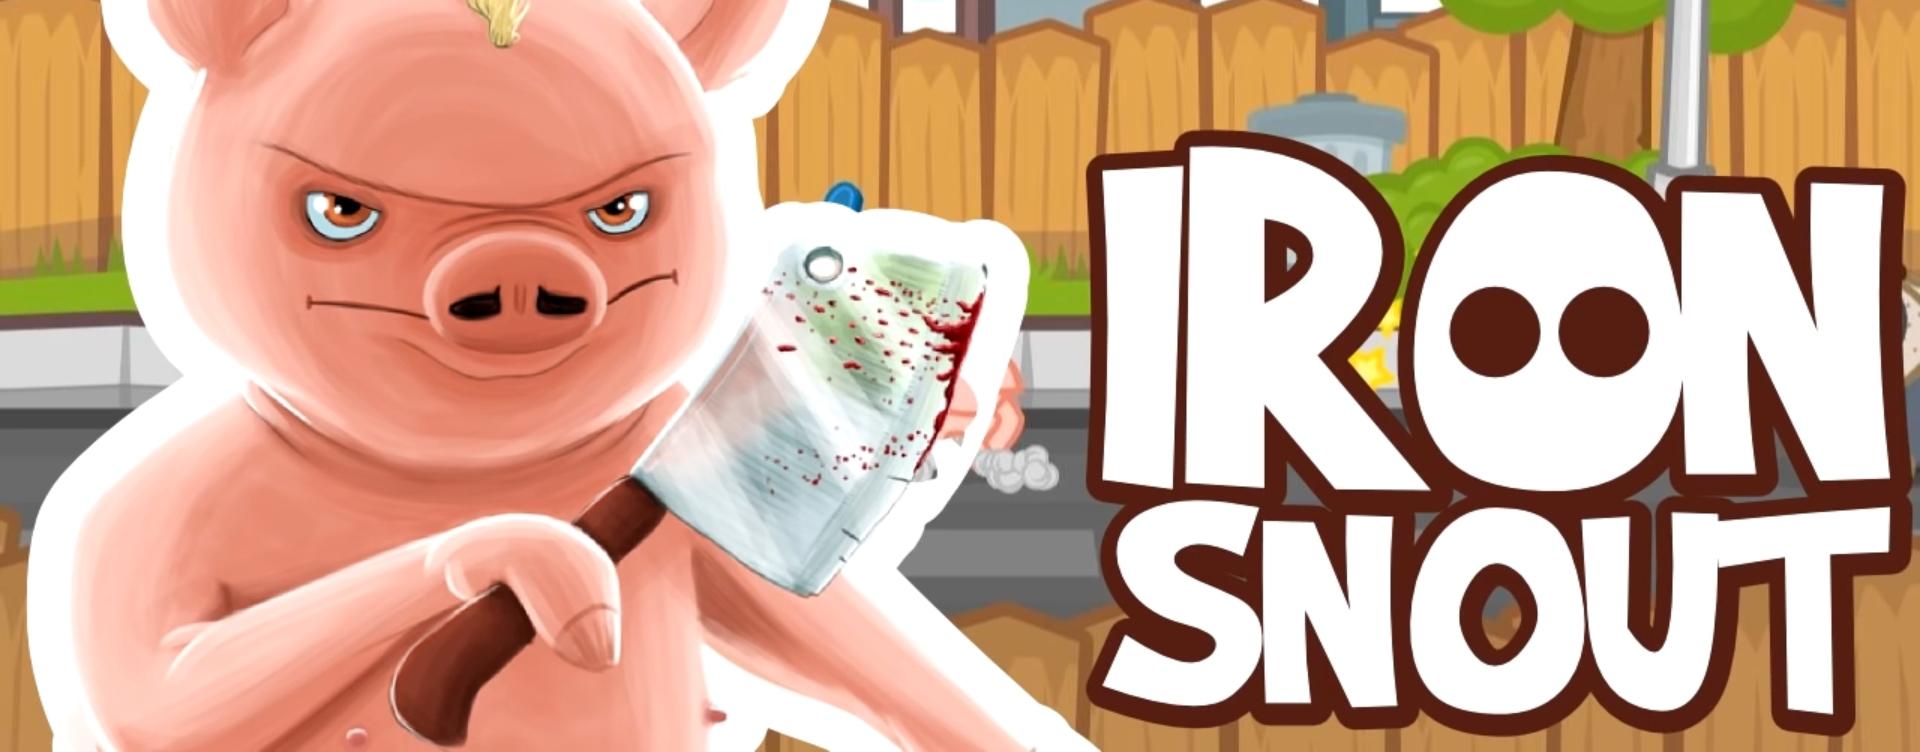 Image Iron Snout+